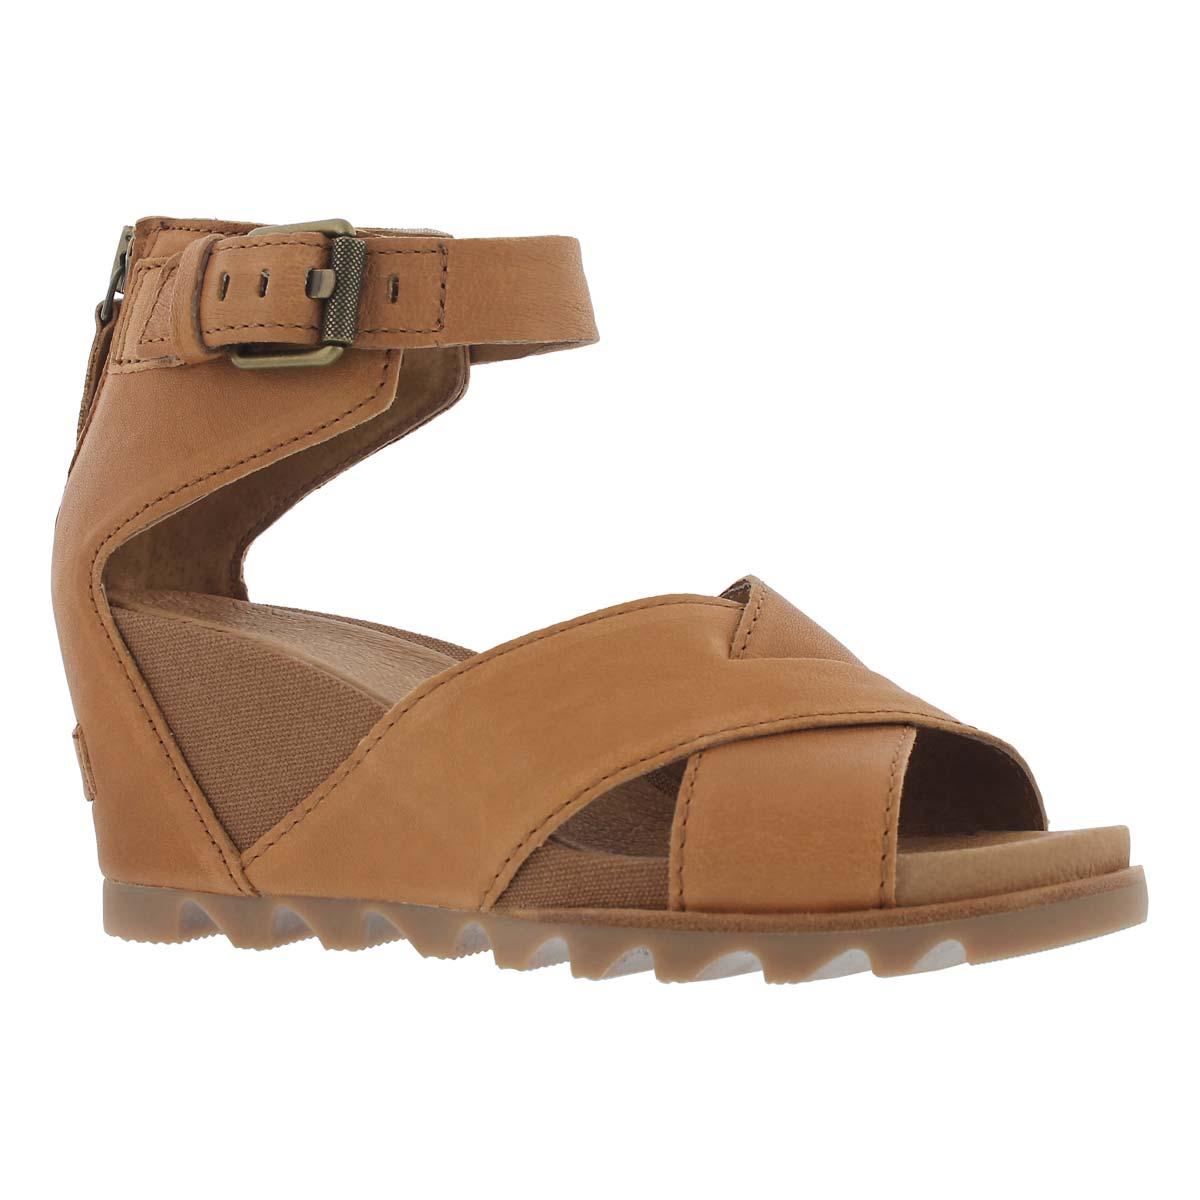 Women's JOANIE II camel brown wedge sandals